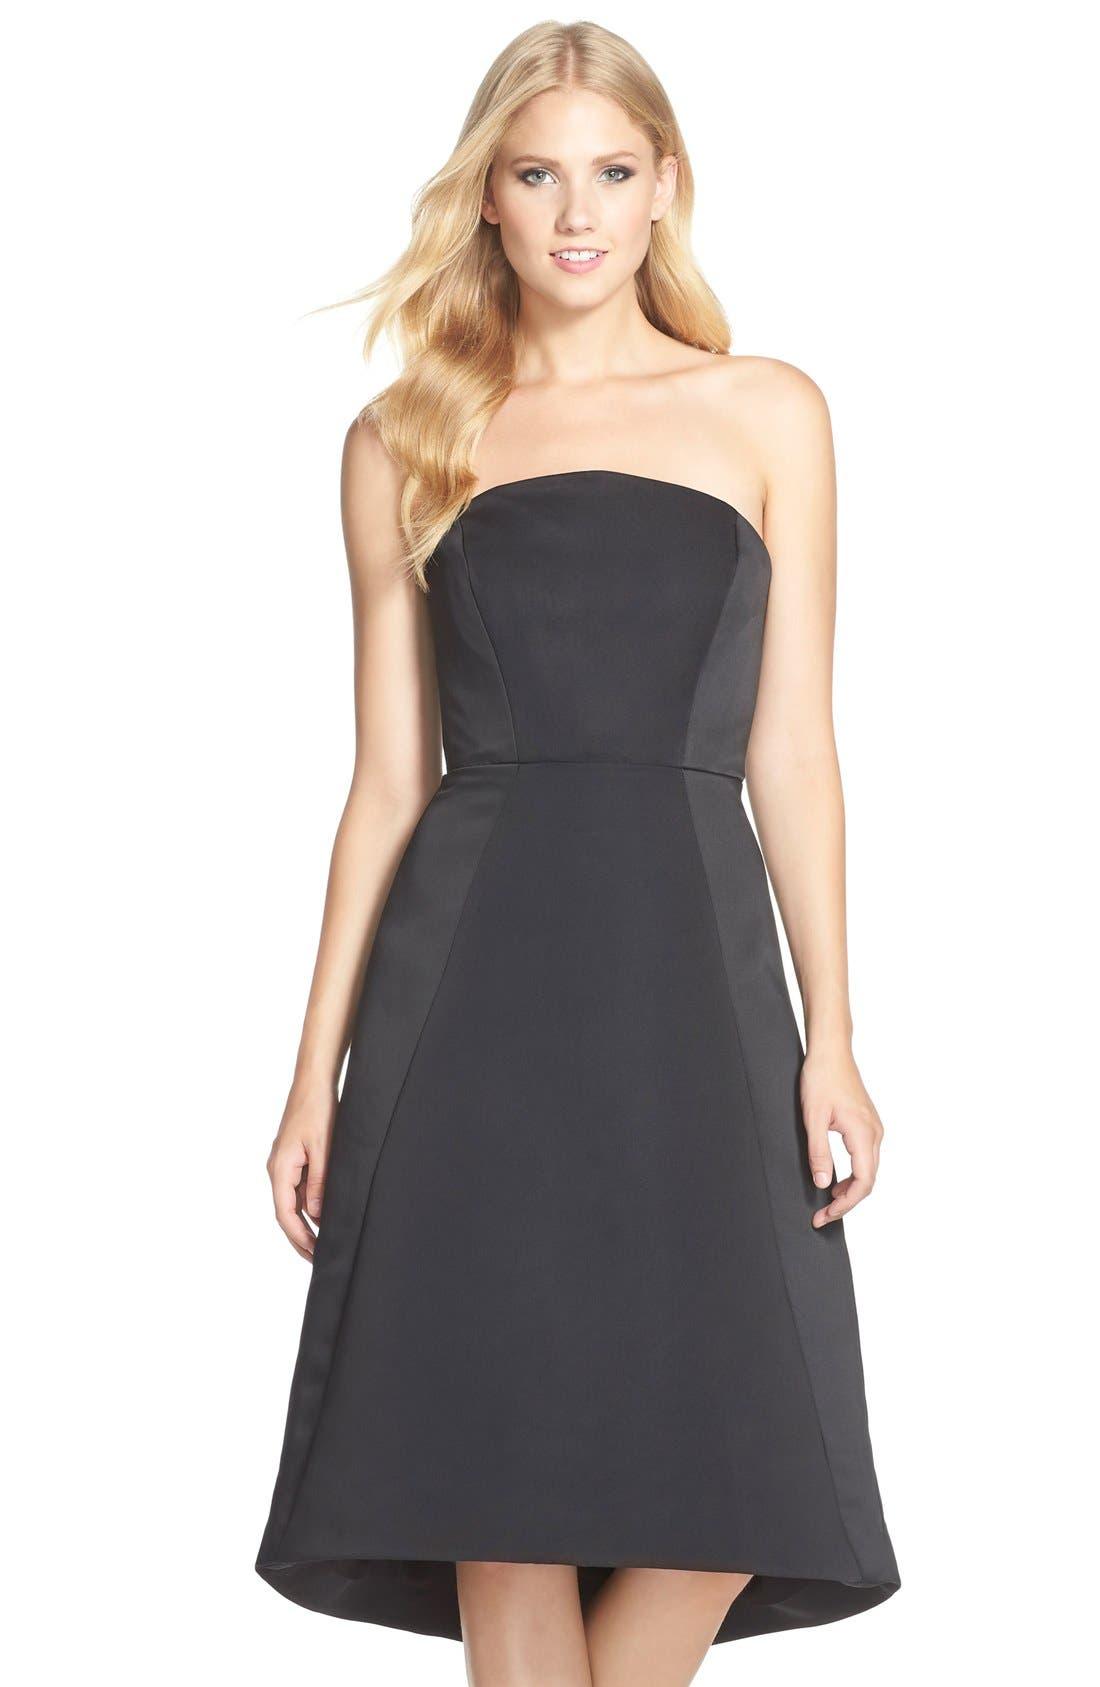 Main Image - HalstonHeritage Strapless Satin Fit & Flare Dress